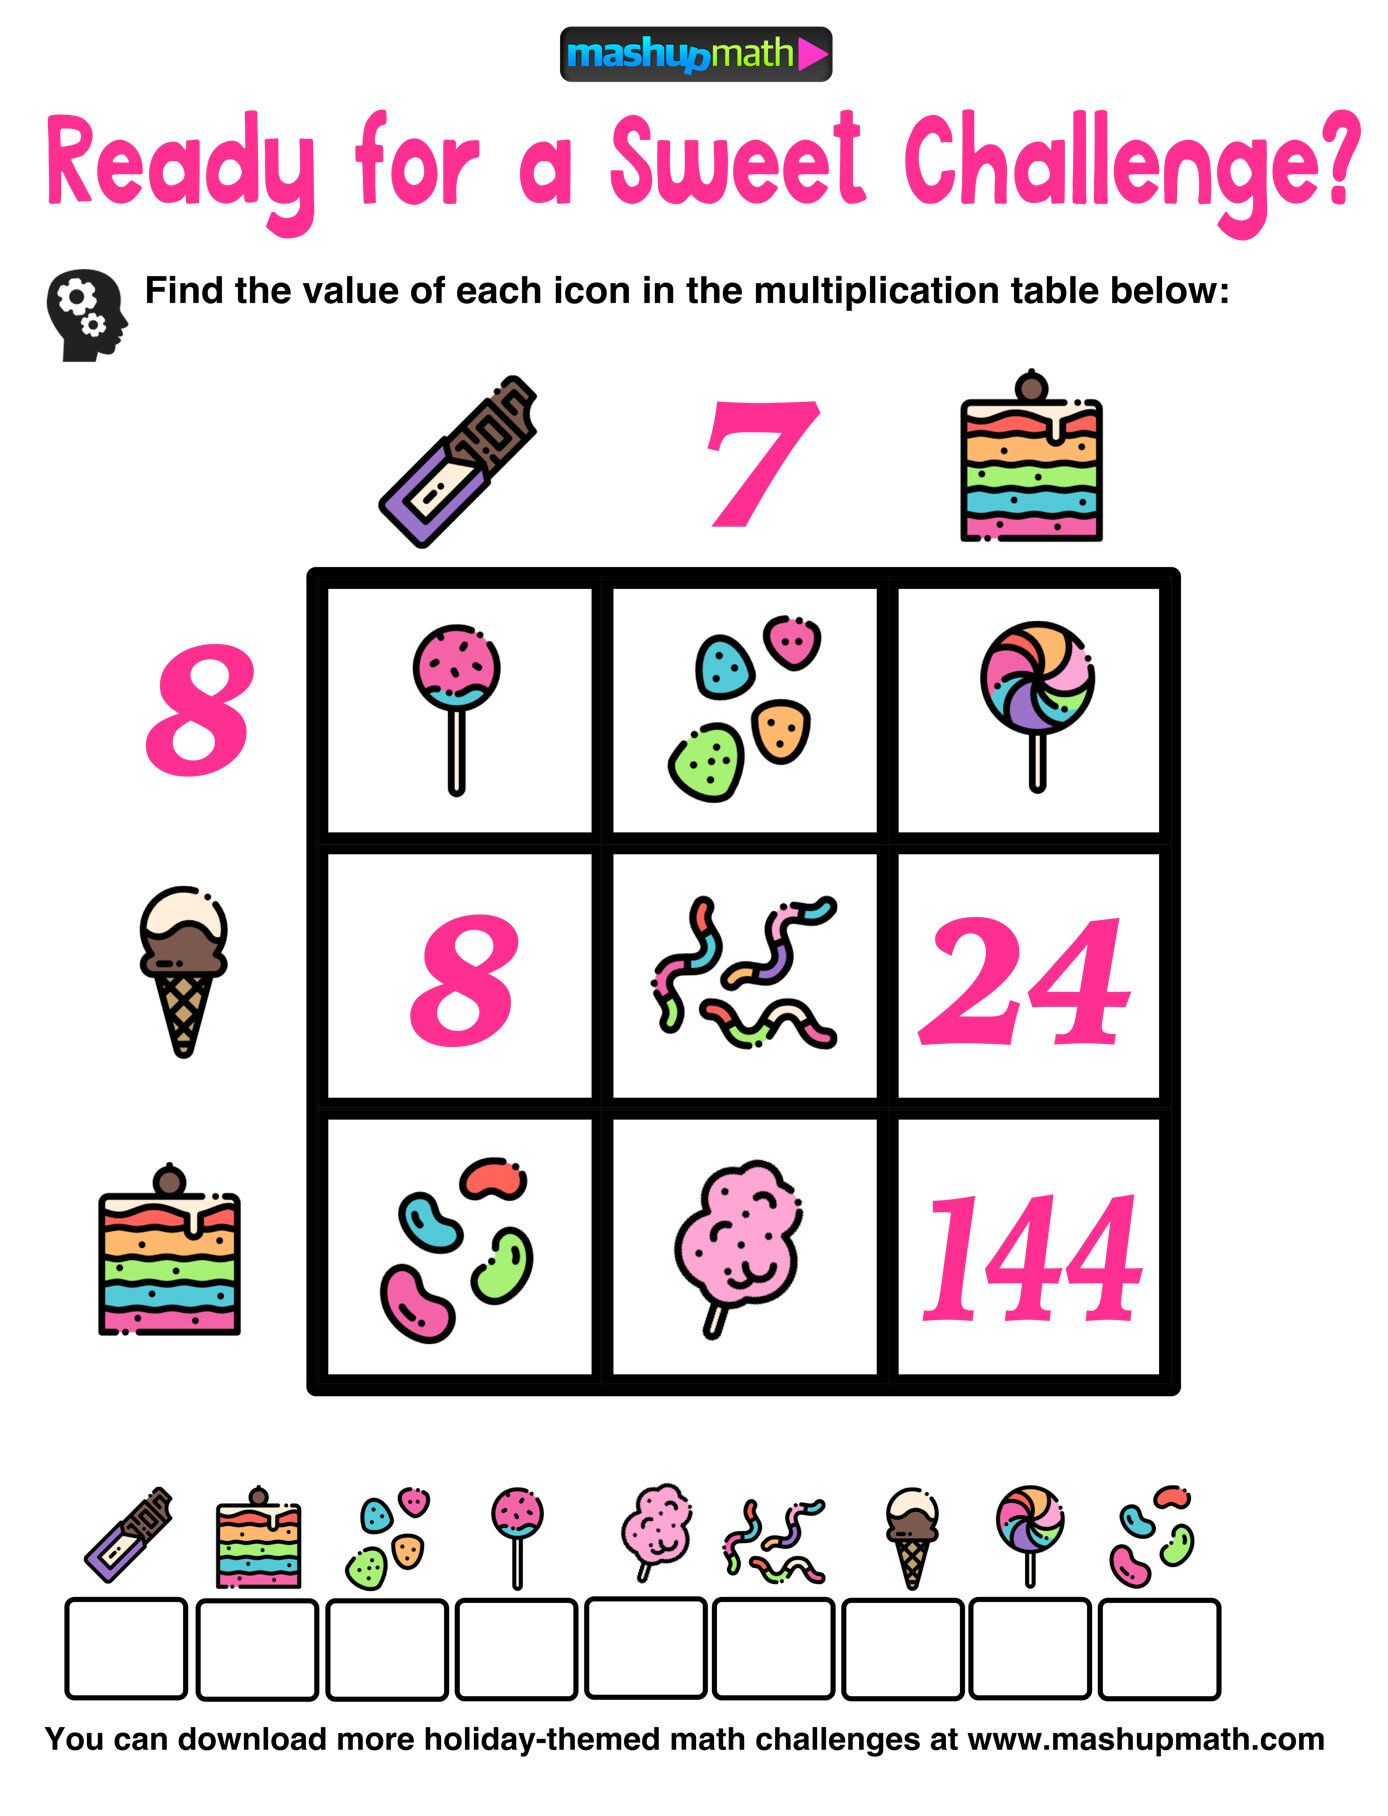 medium resolution of Multiplication Table Worksheets: Free Printable Math Puzzles — Mashup Math    Maths puzzles